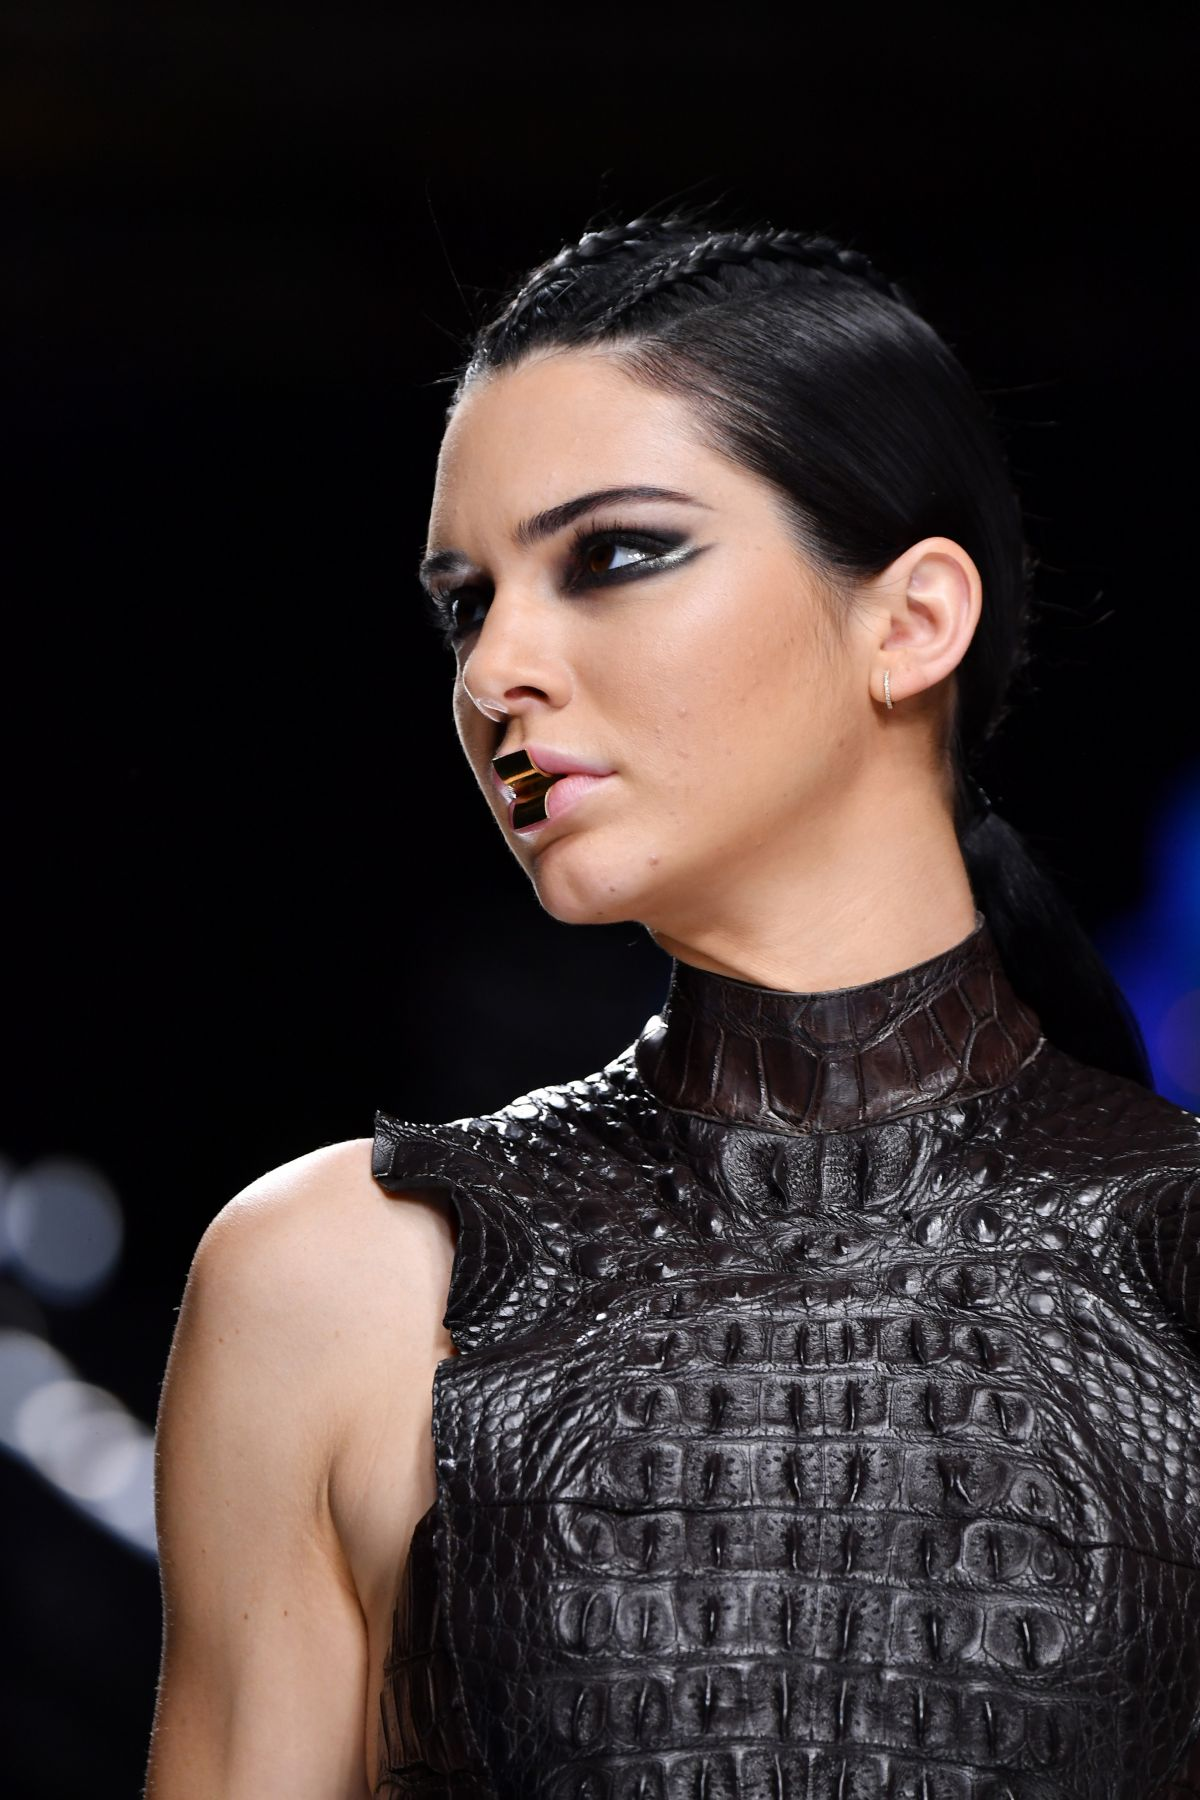 Kendall Jenner At Balmain Fashion Show At Paris Fashion Week 03 02